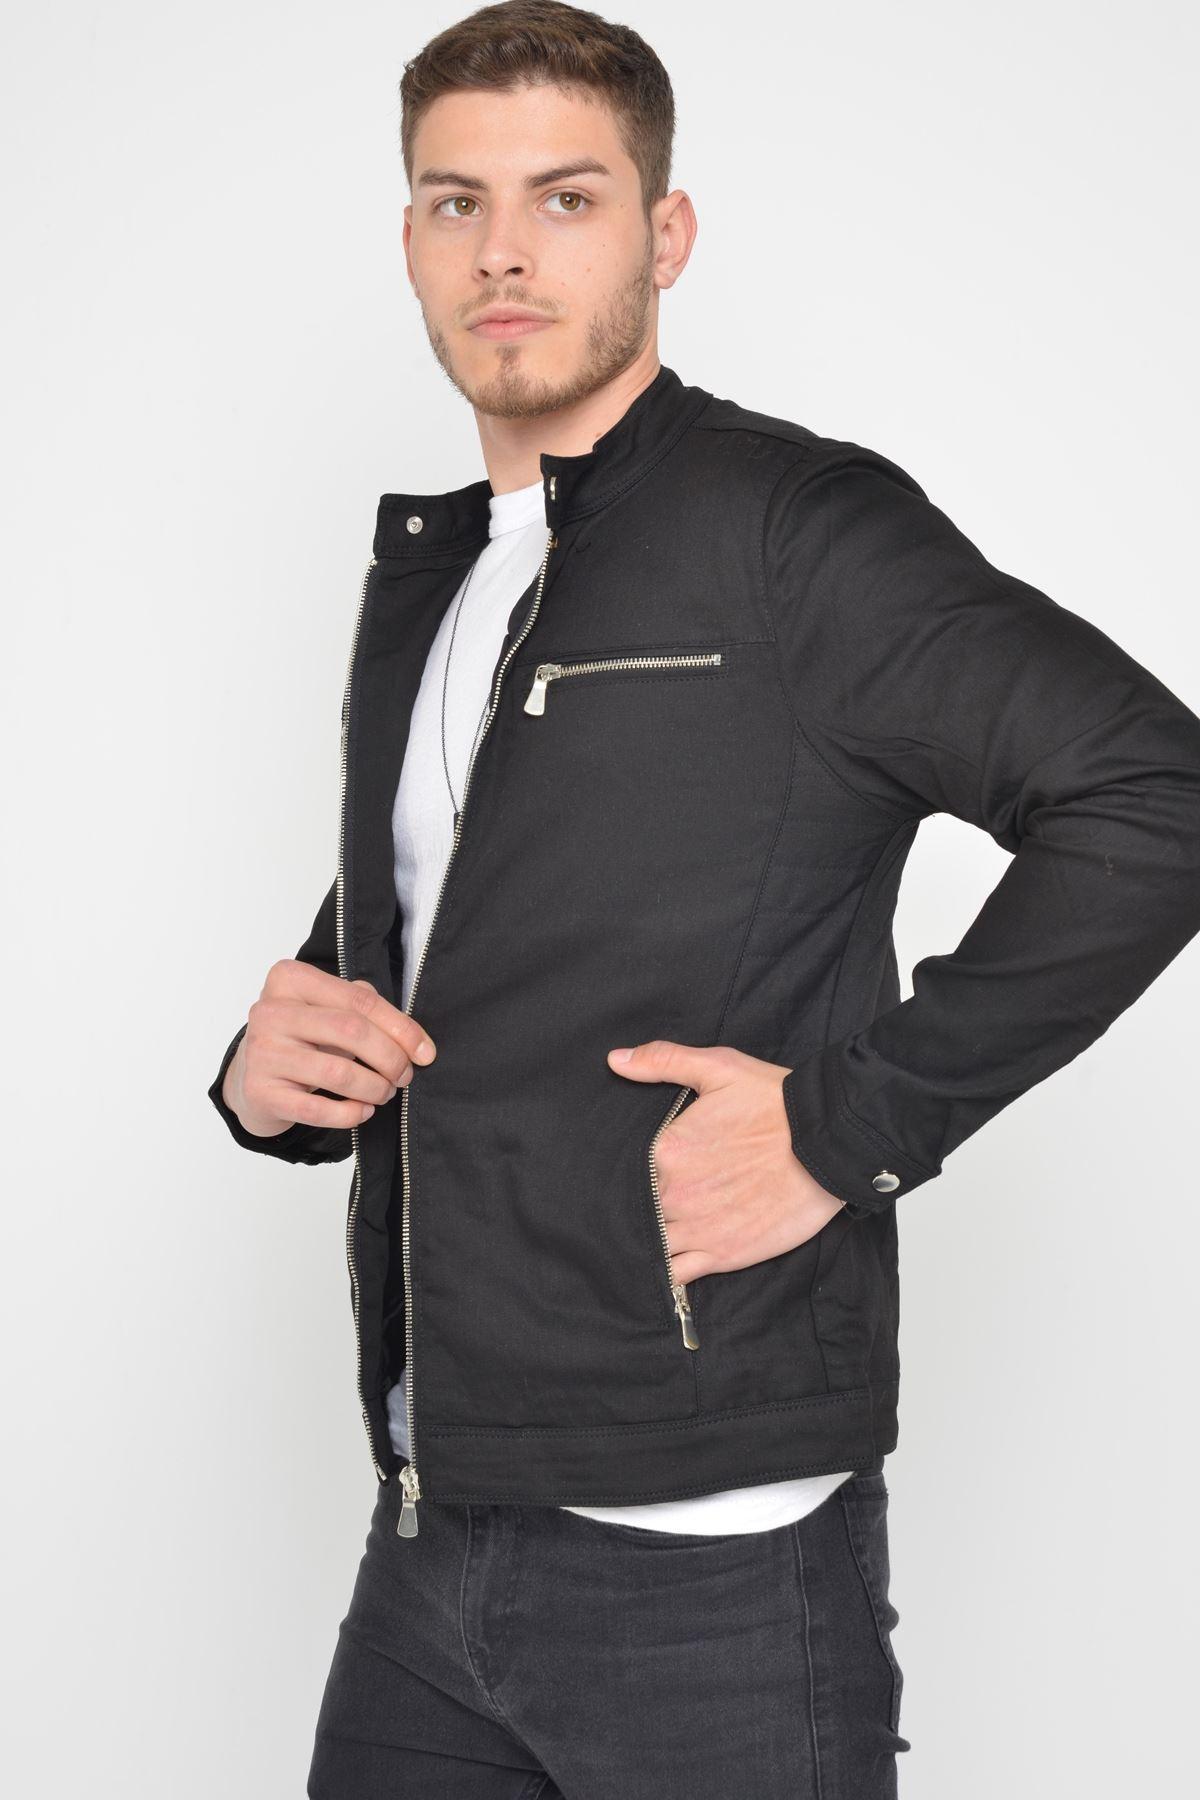 Mevsimlik Fermuar Detay astarlı Premium Erkek Siay Ceket Mont